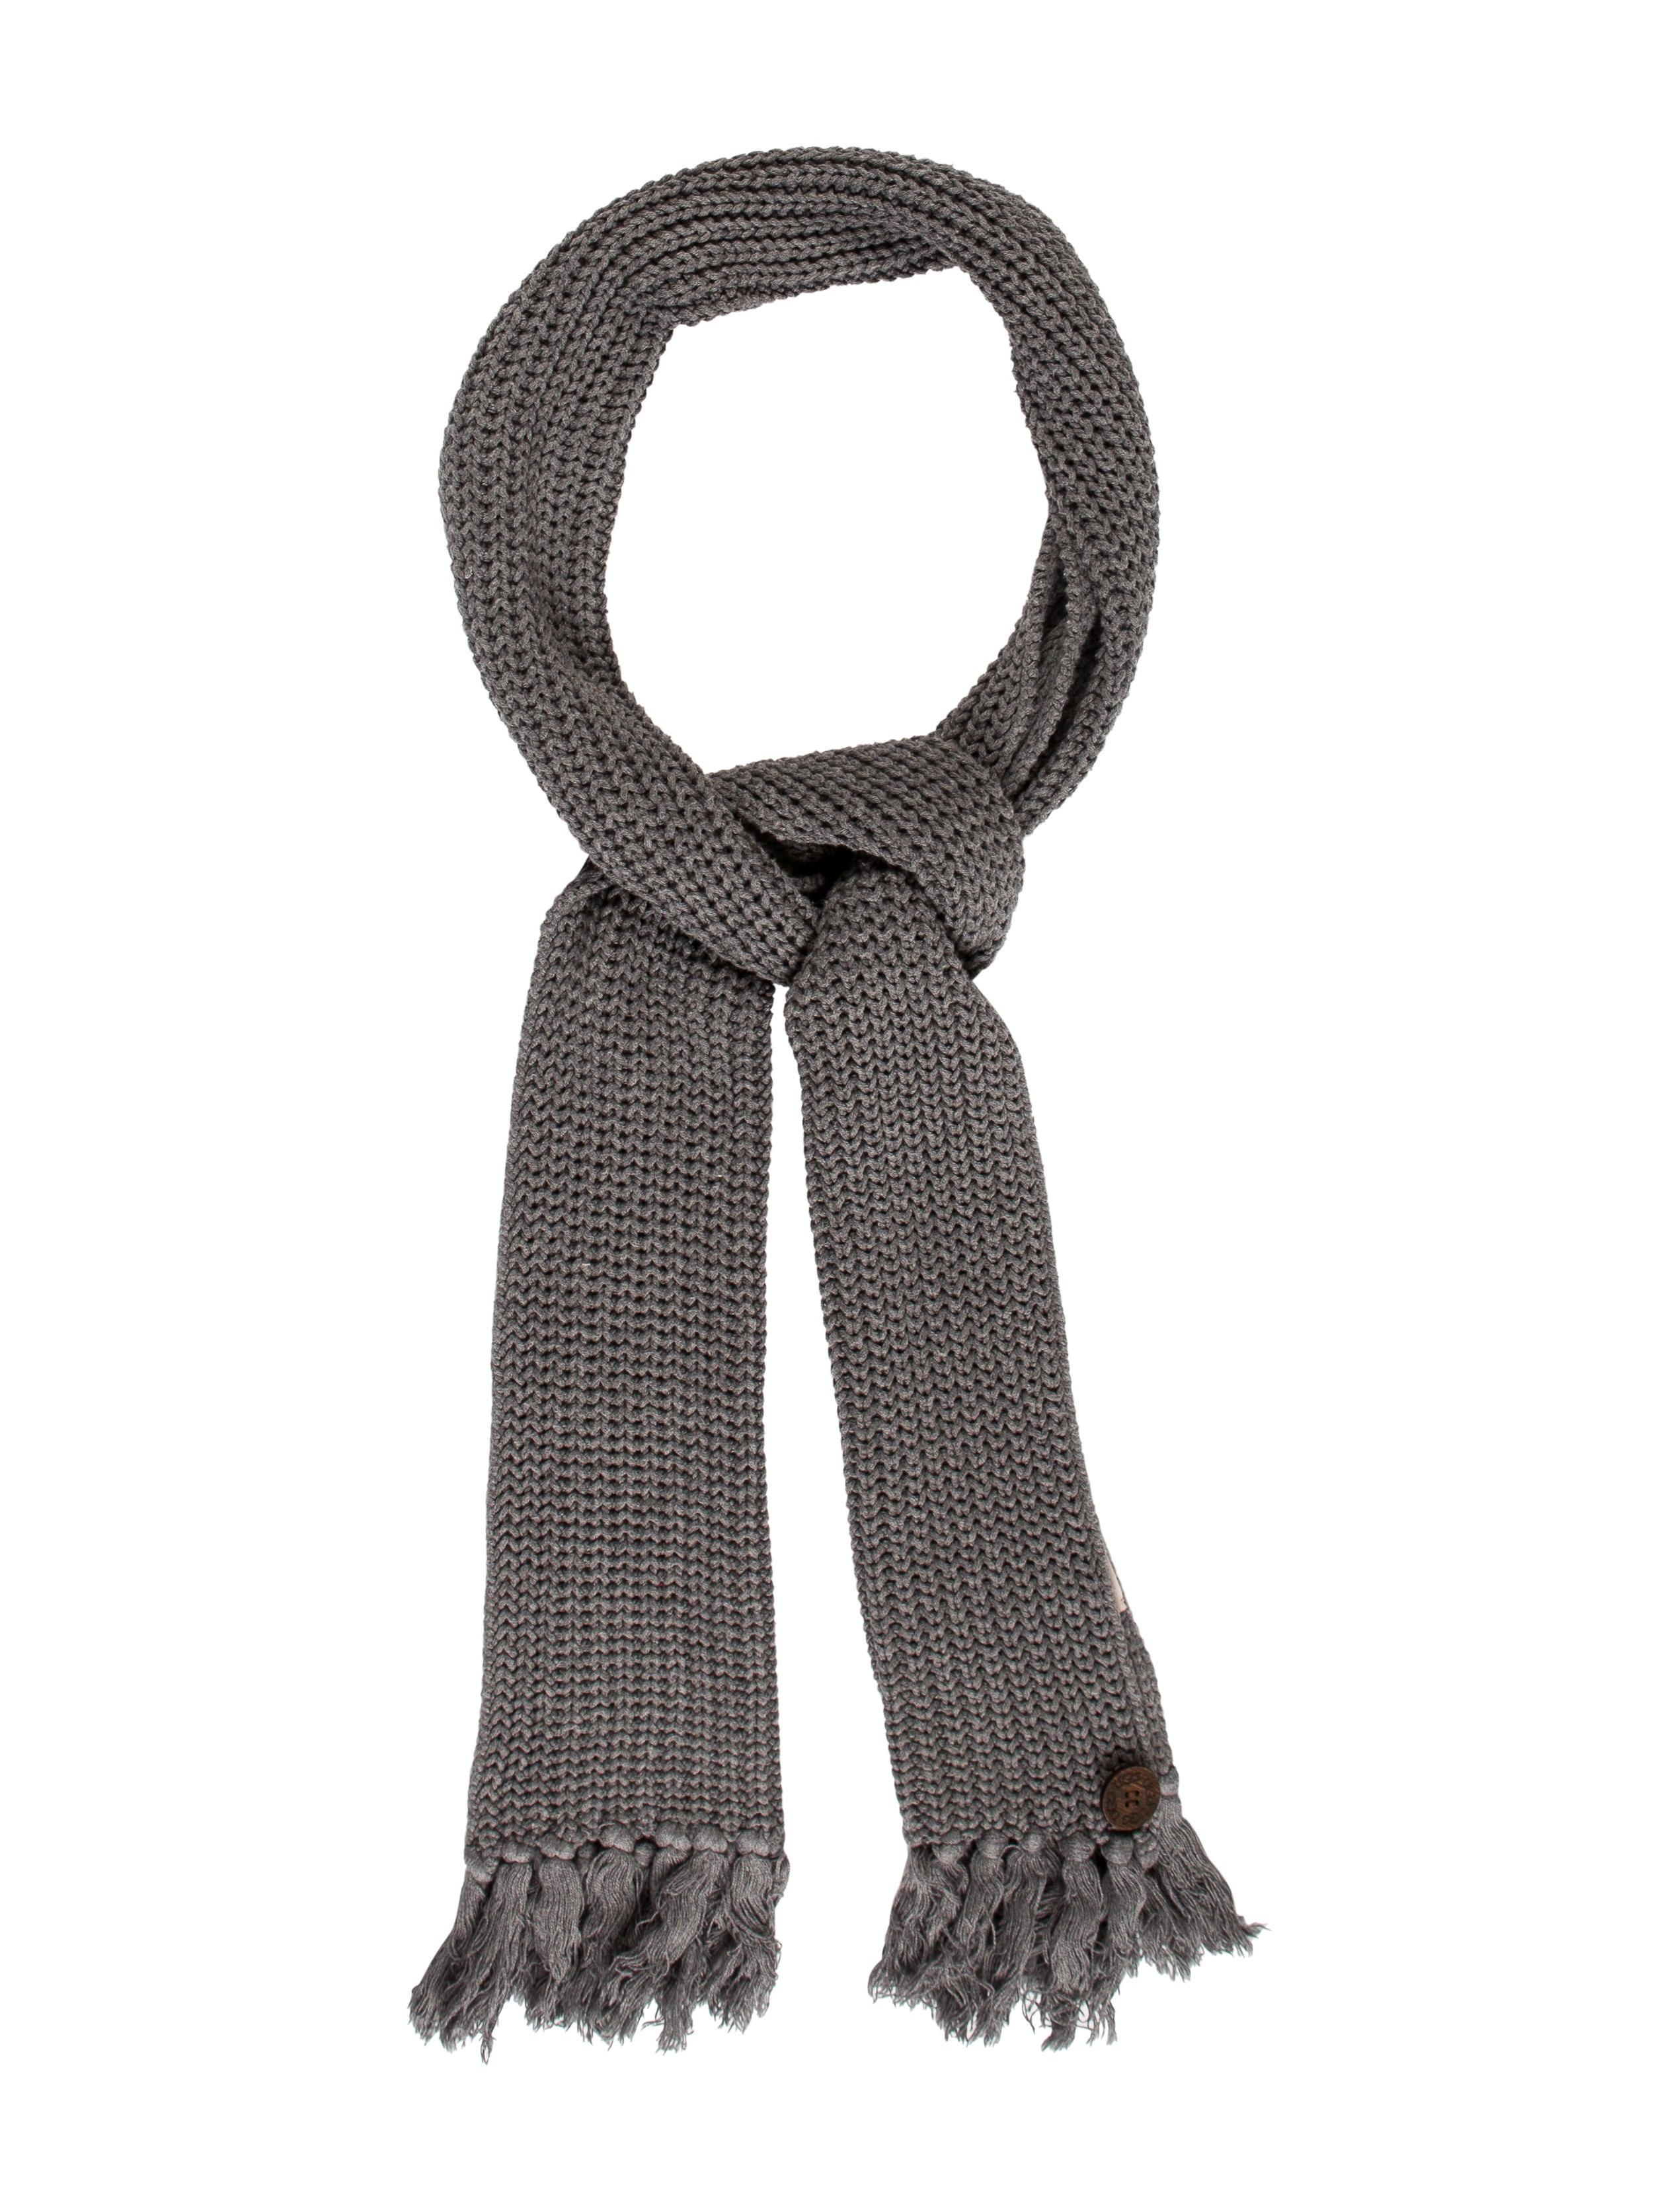 Knitting Websites Australia : Ugg australia fringe knit scarf accessories wuugg